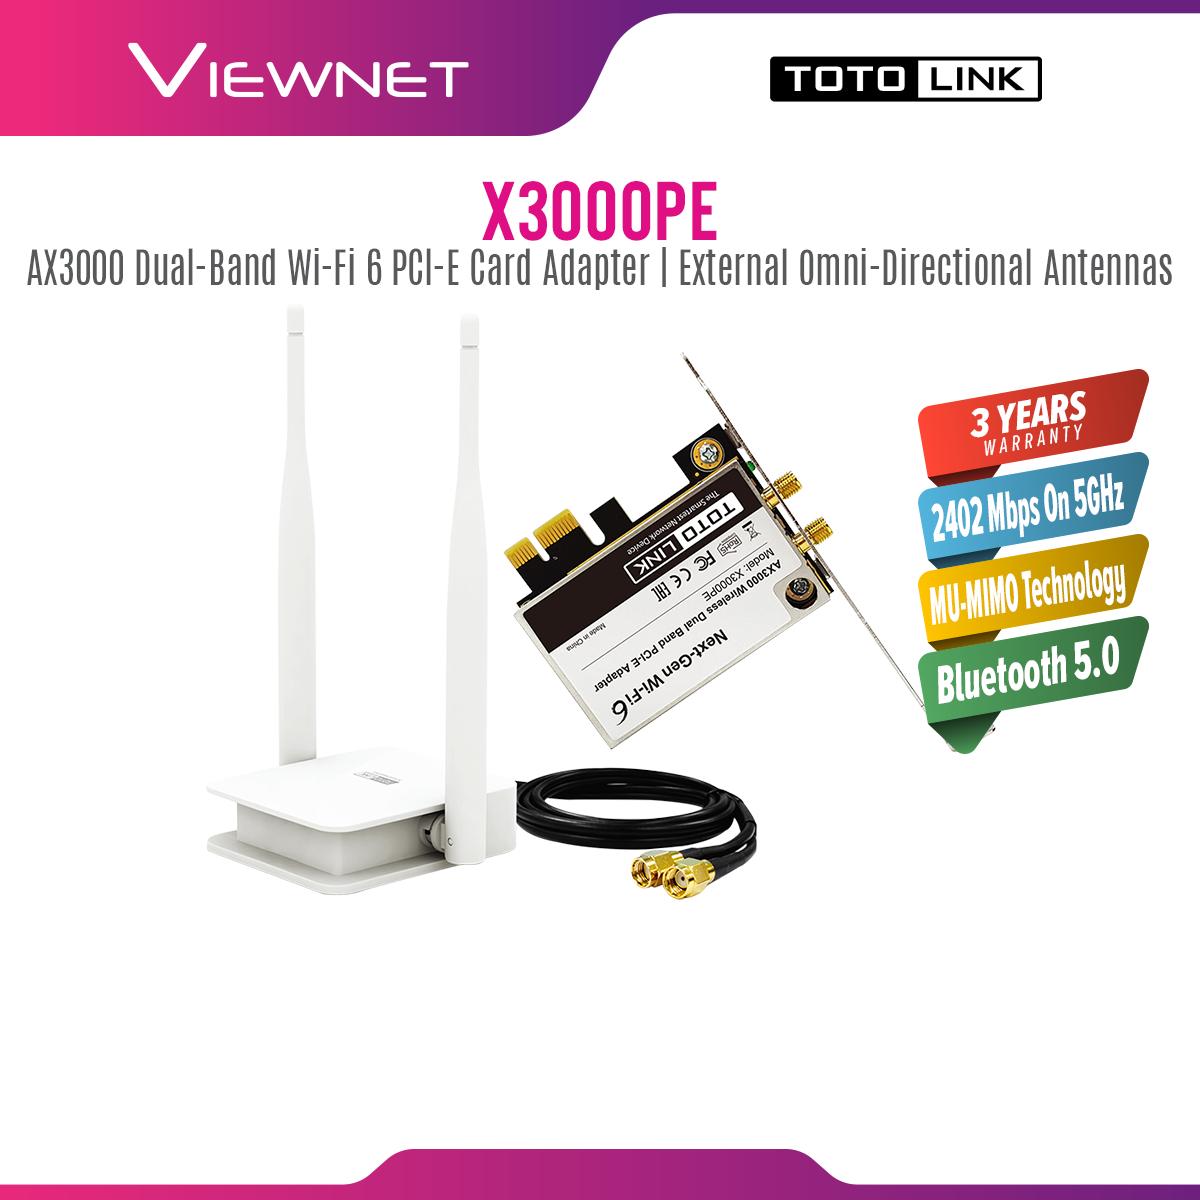 Totolink PCI-E AX3000 Wifi Adapter (X3000PE) *COME WITH LOW PROFILE BRACKET* X3000PE PCIE CARD PCE CARD